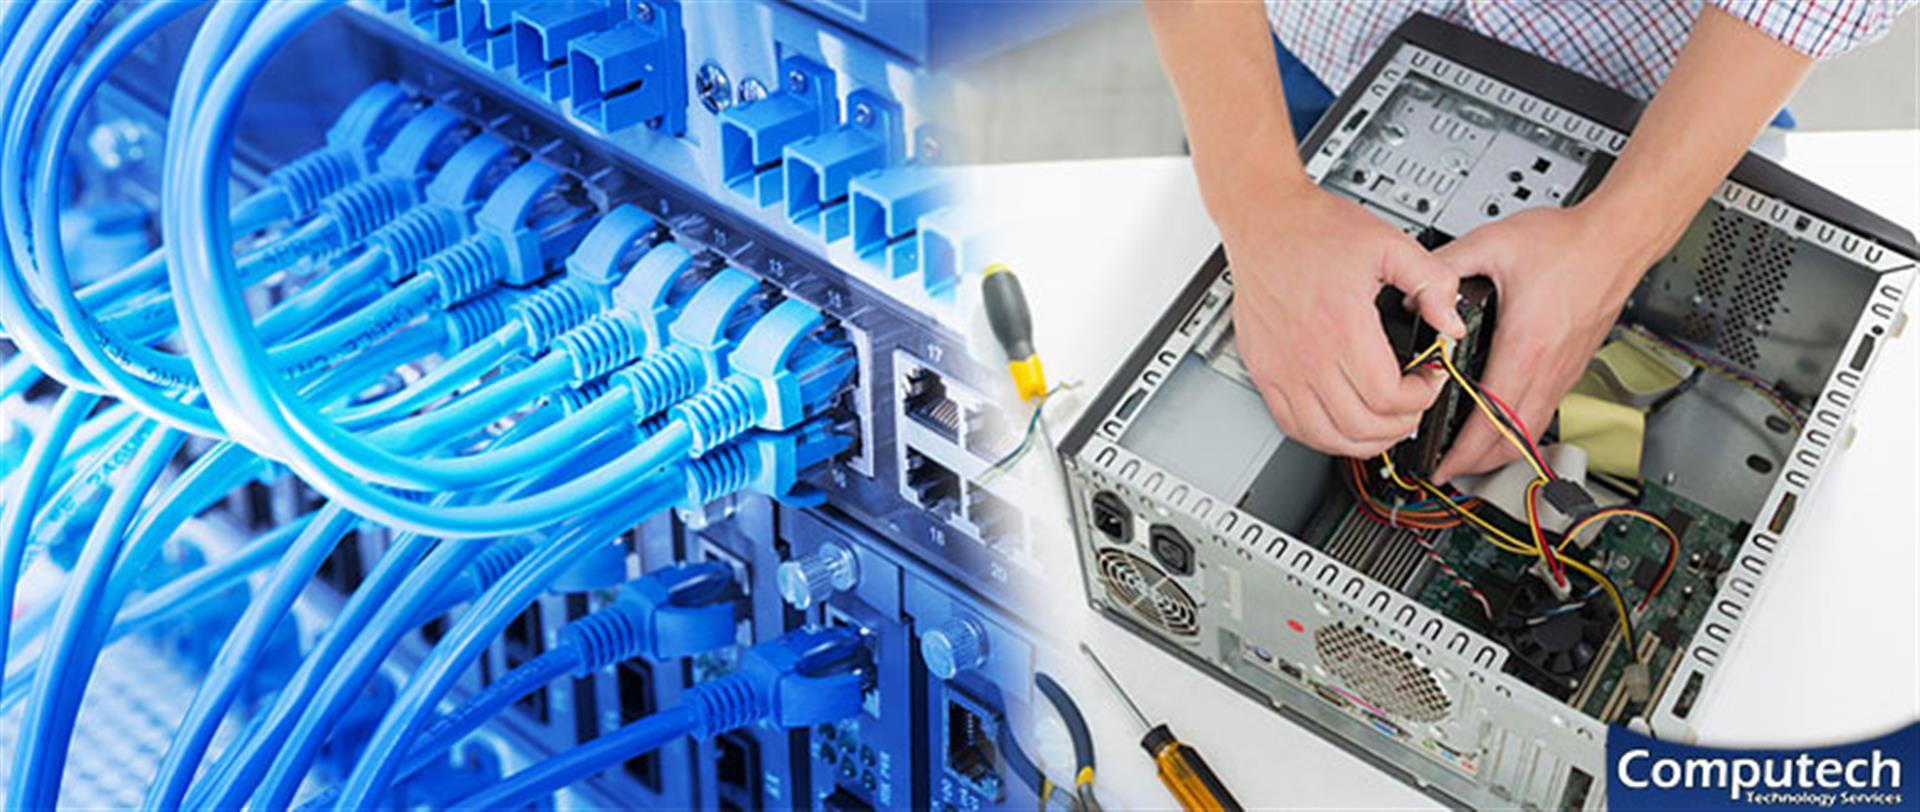 Chickasaw Alabama Onsite Computer PC & Printer Repairs, Network, Telecom & Data Wiring Solutions